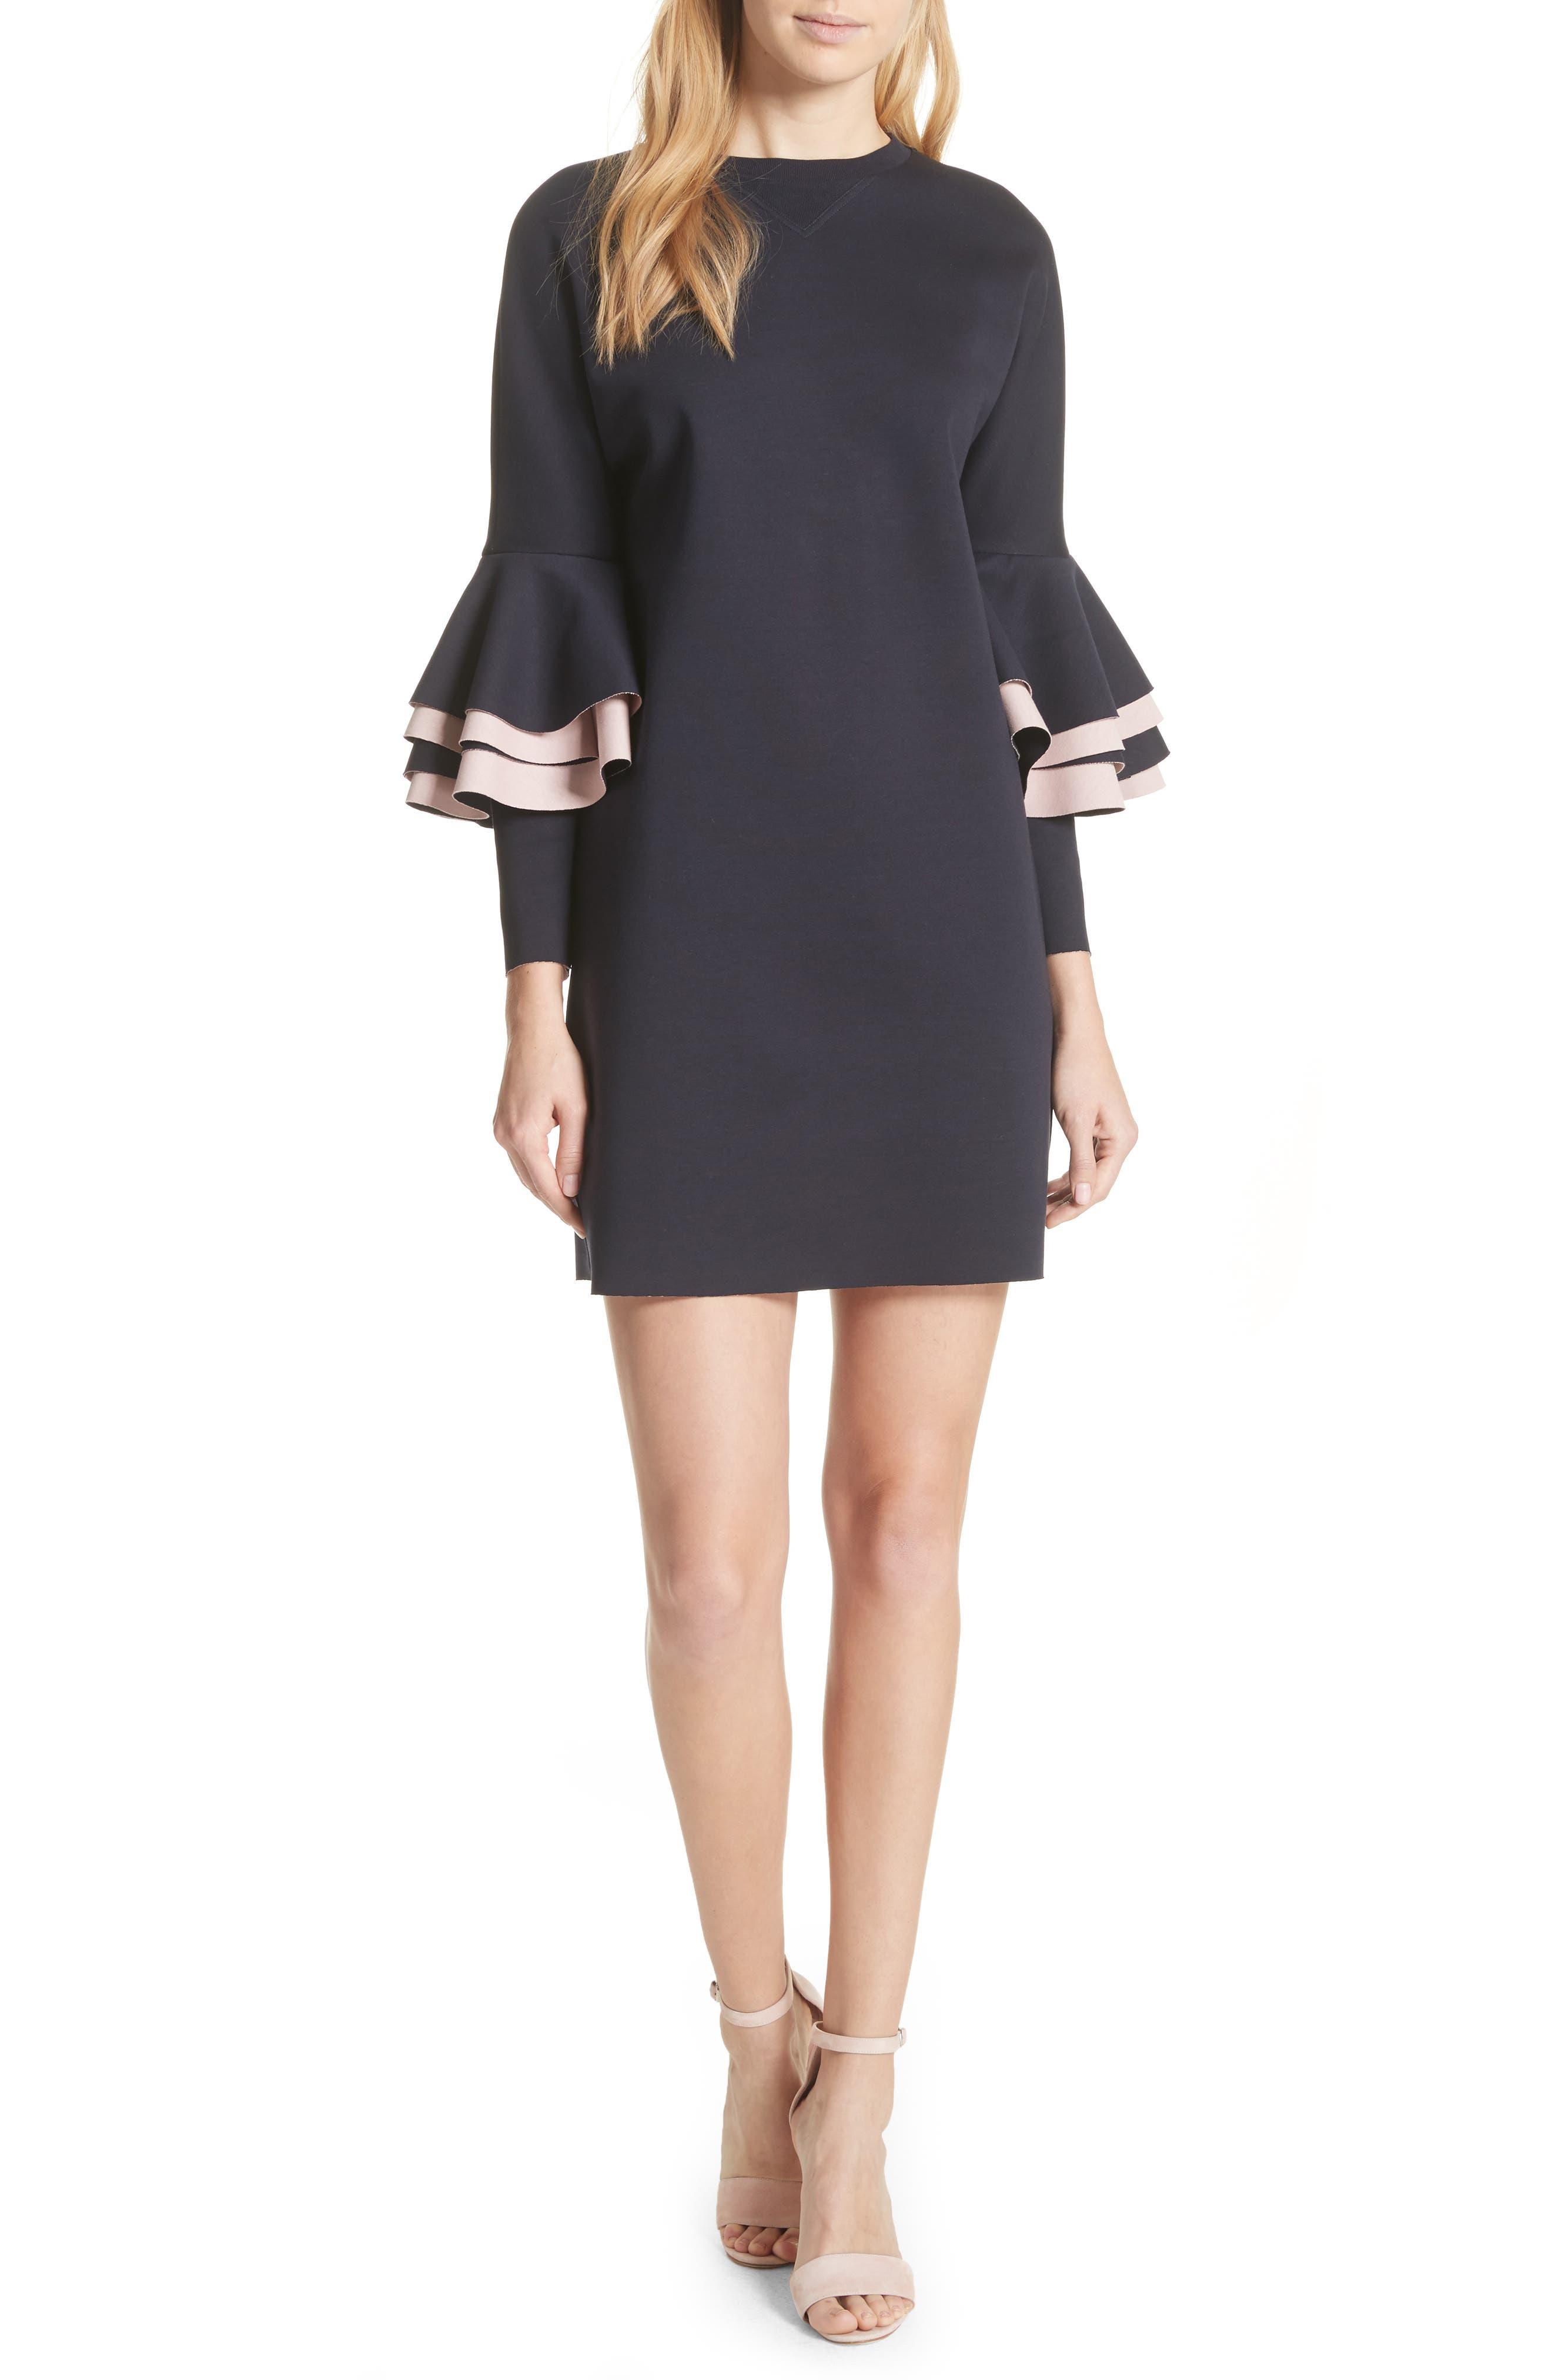 Chloae Frill Sleeve Sweatshirt Dress,                             Main thumbnail 1, color,                             Navy